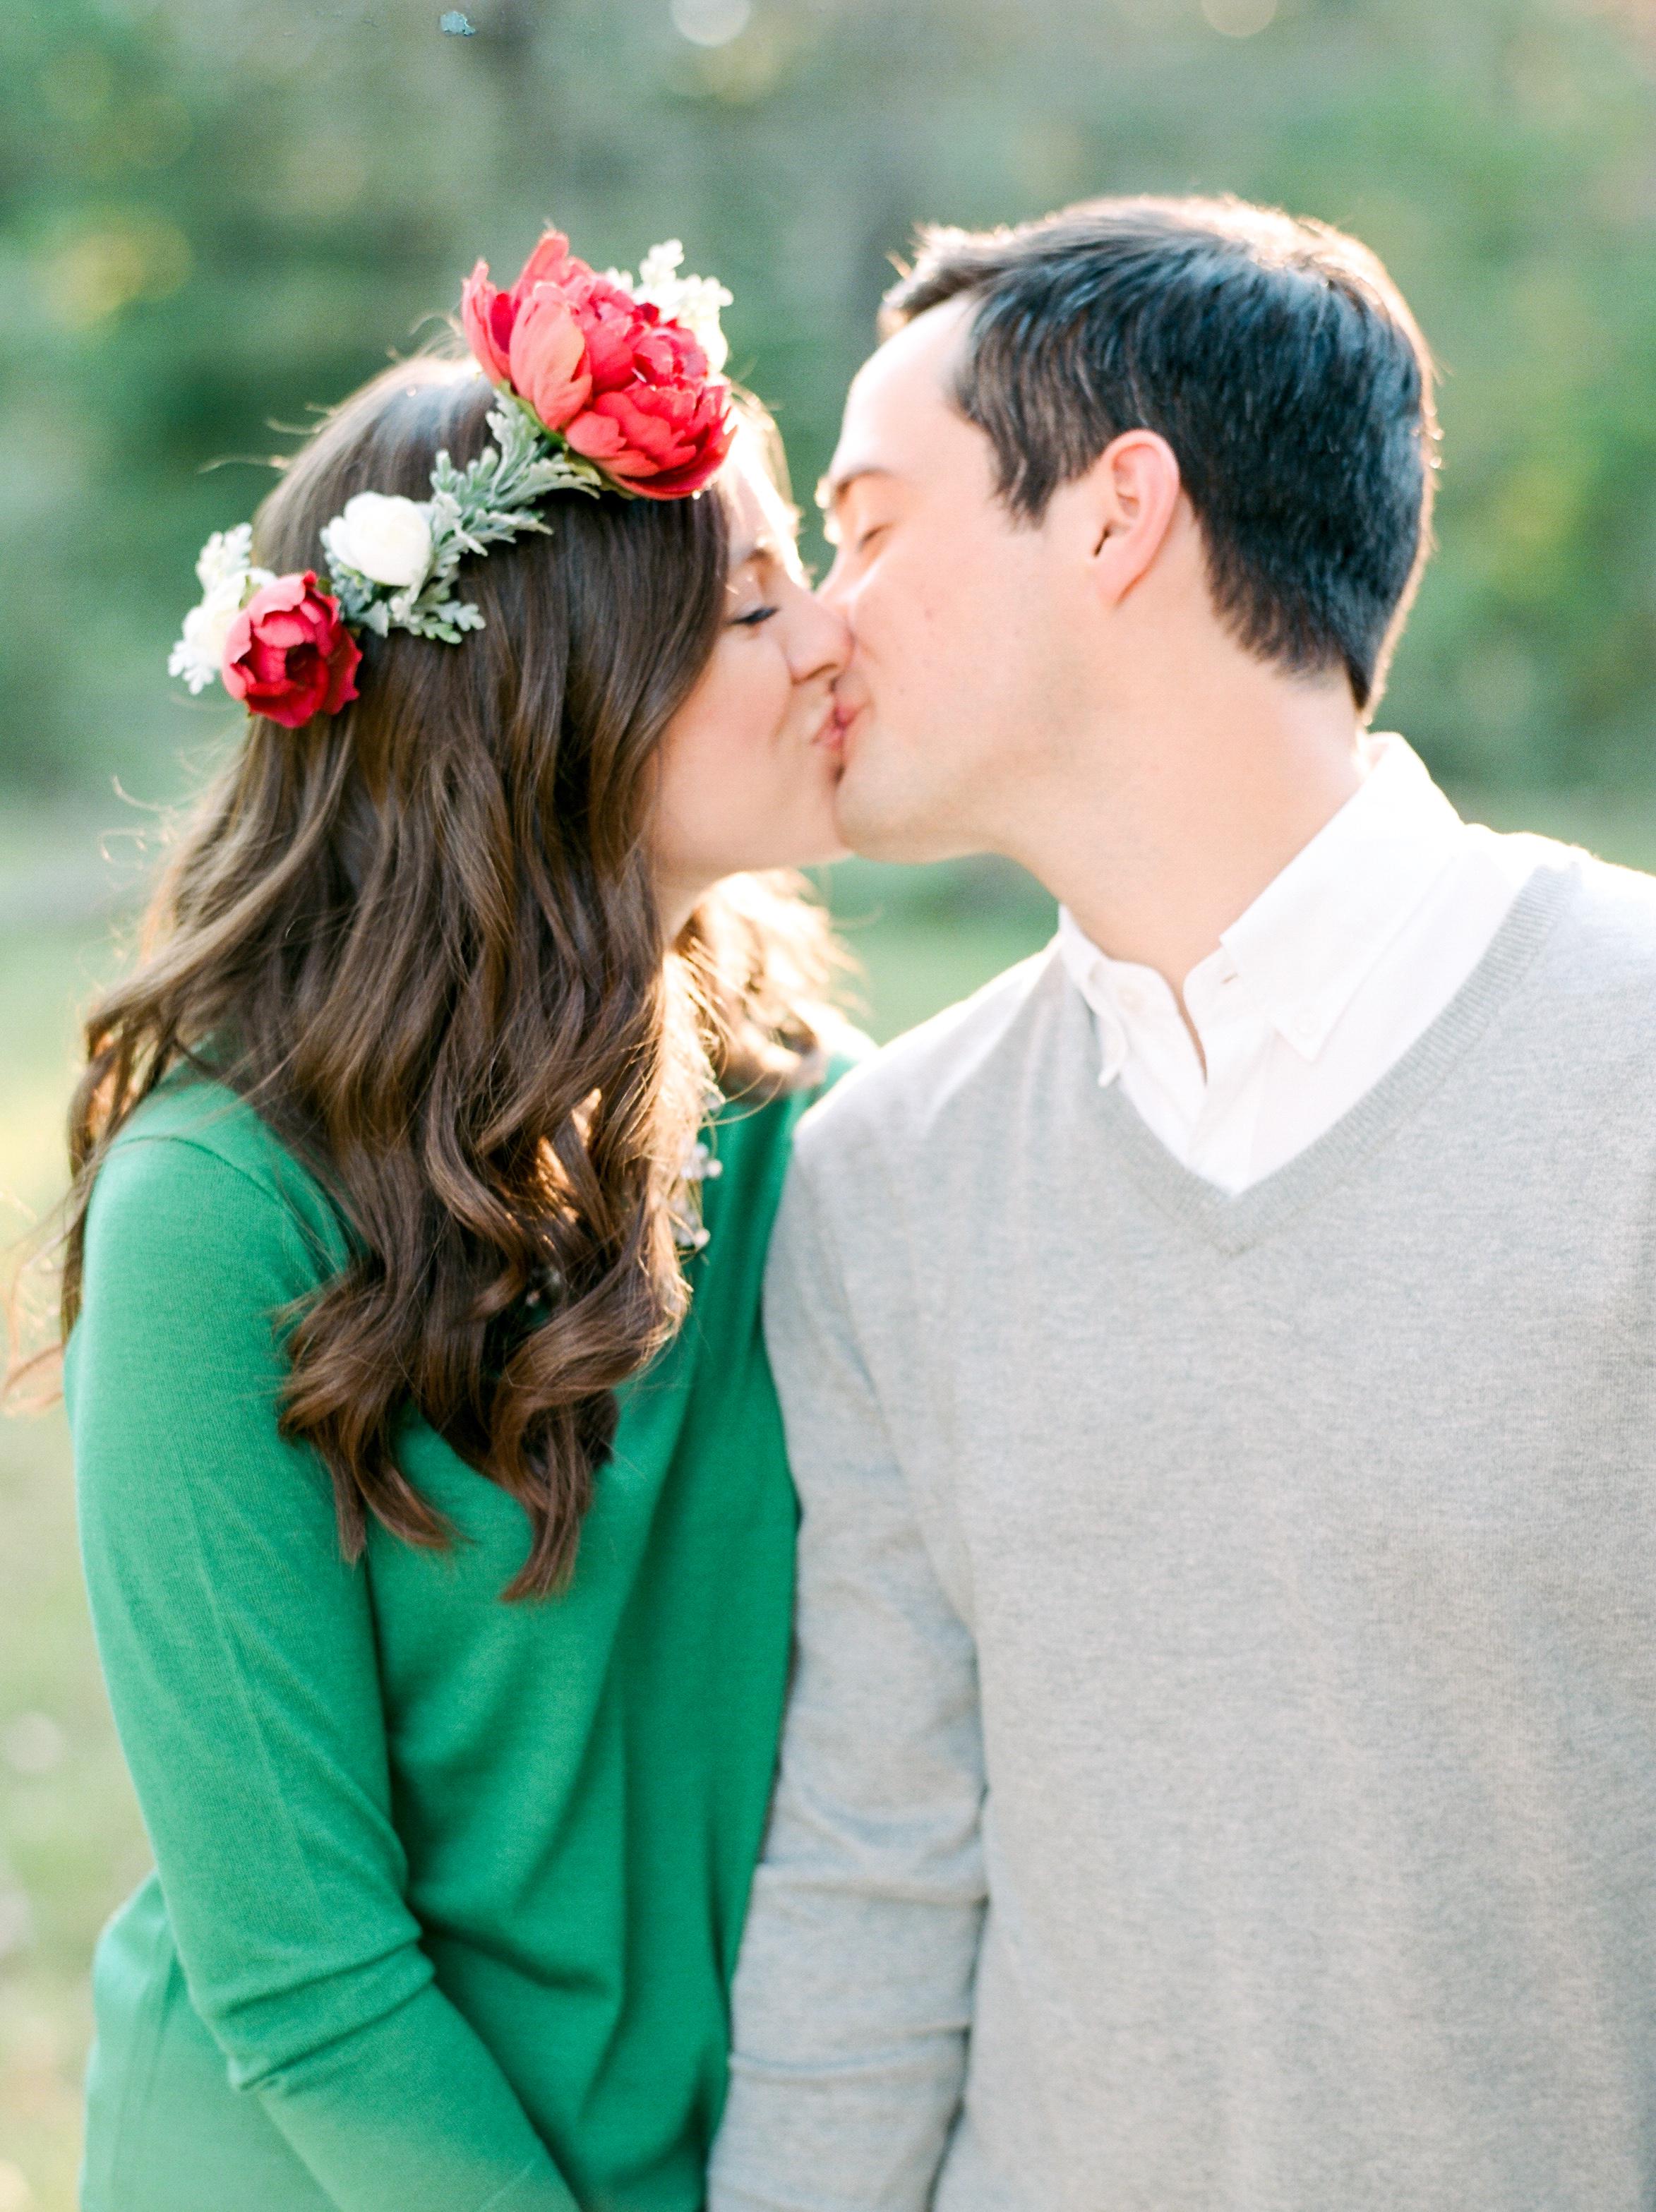 houston-wedding-photographer-college-station-austin-the-woodlands-film-photography-style-me-pretty-engagements-dana-fernandez-photography-17.jpg